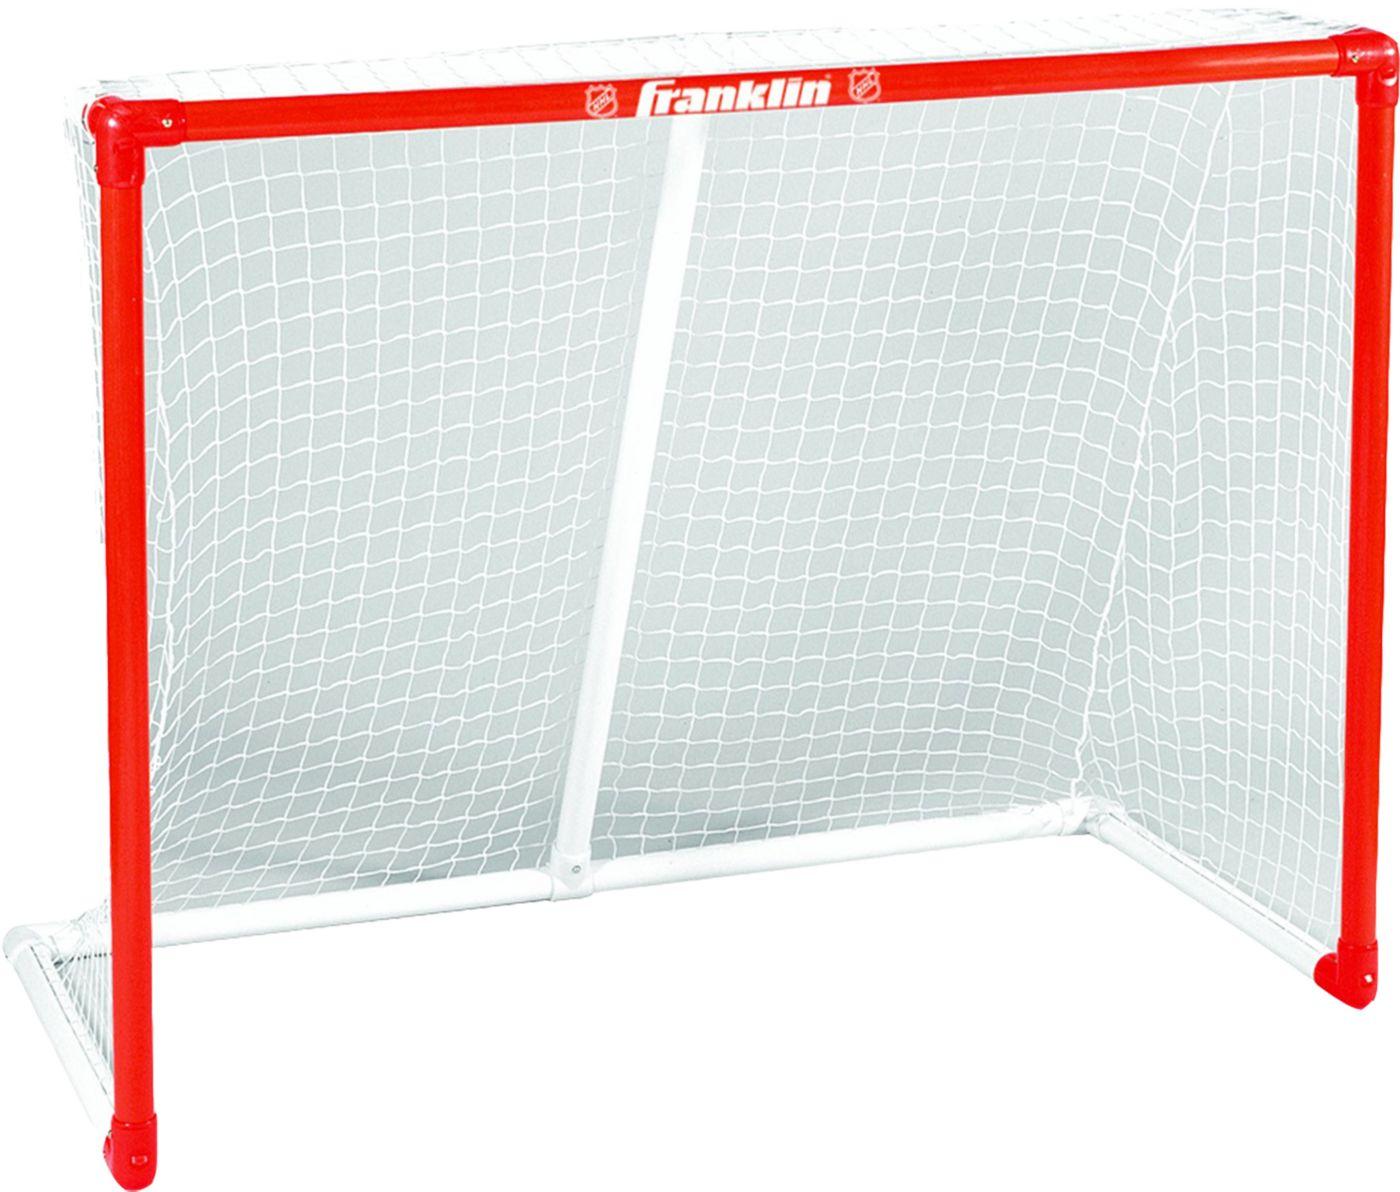 "Franklin NHL 54"" Innernet PVC Street Hockey Goal"